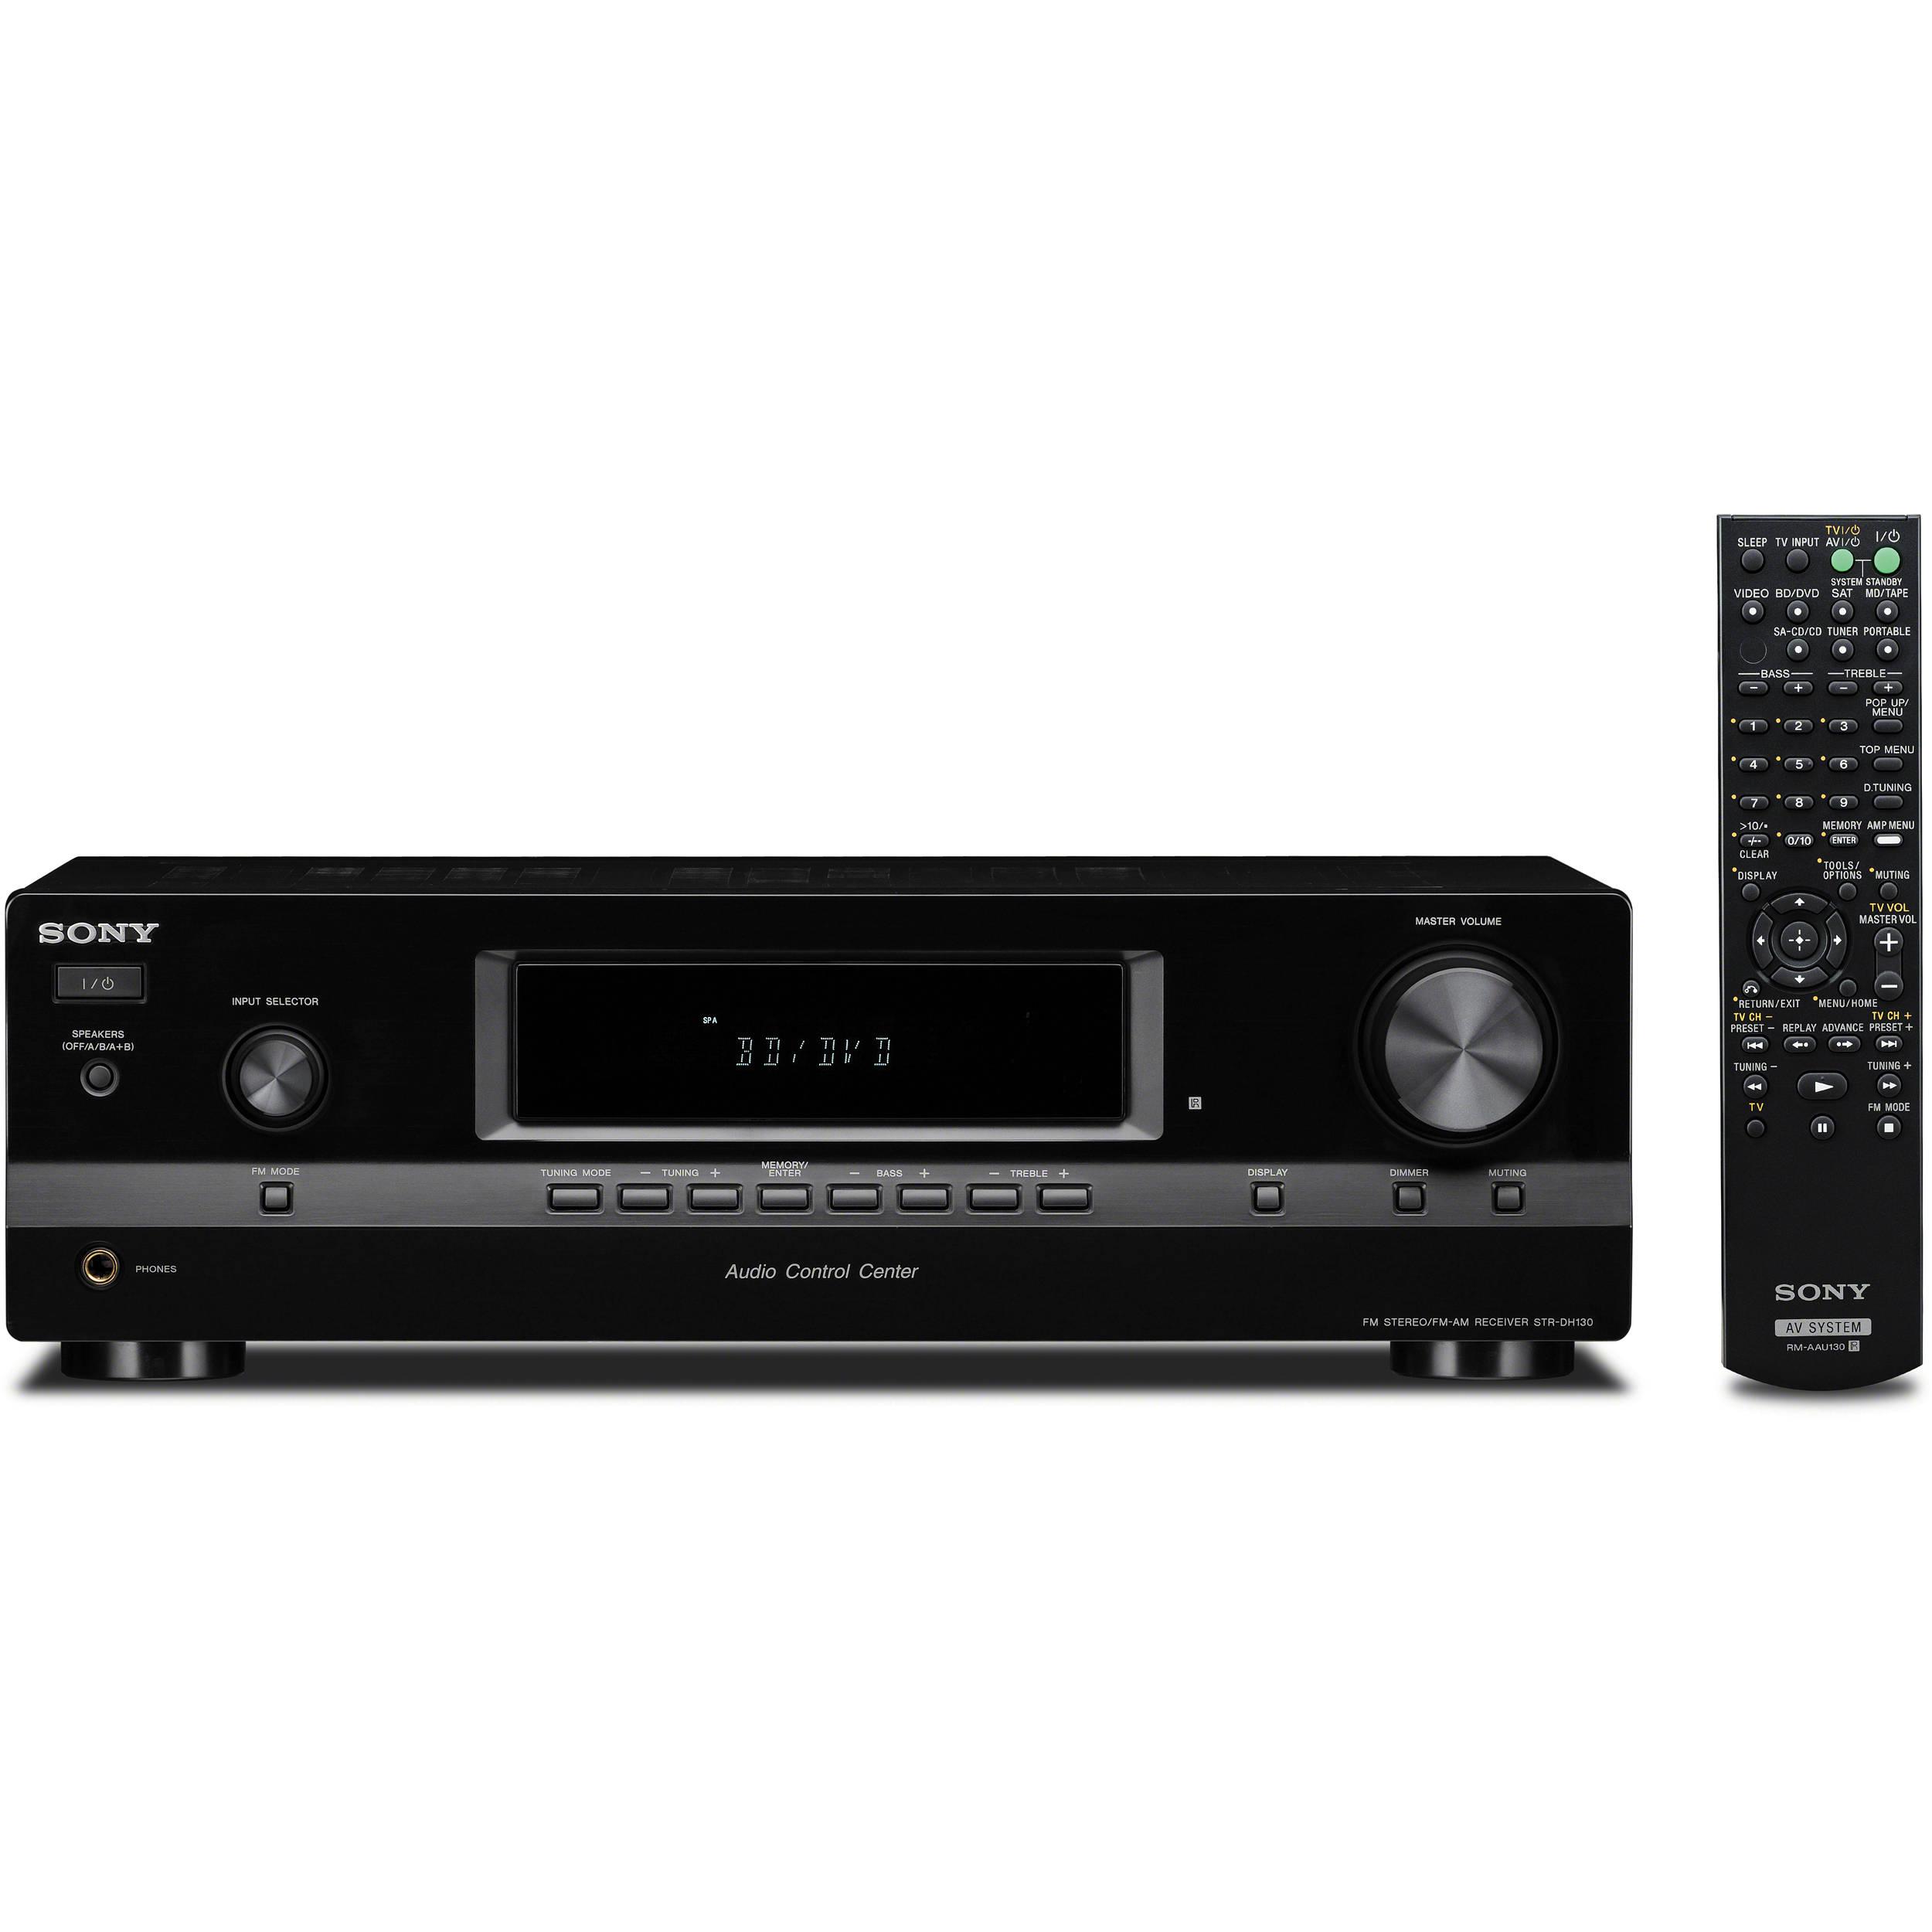 Sony STR-AV310 Digital AM//FM Stereo Audio Video Control Center Receiver